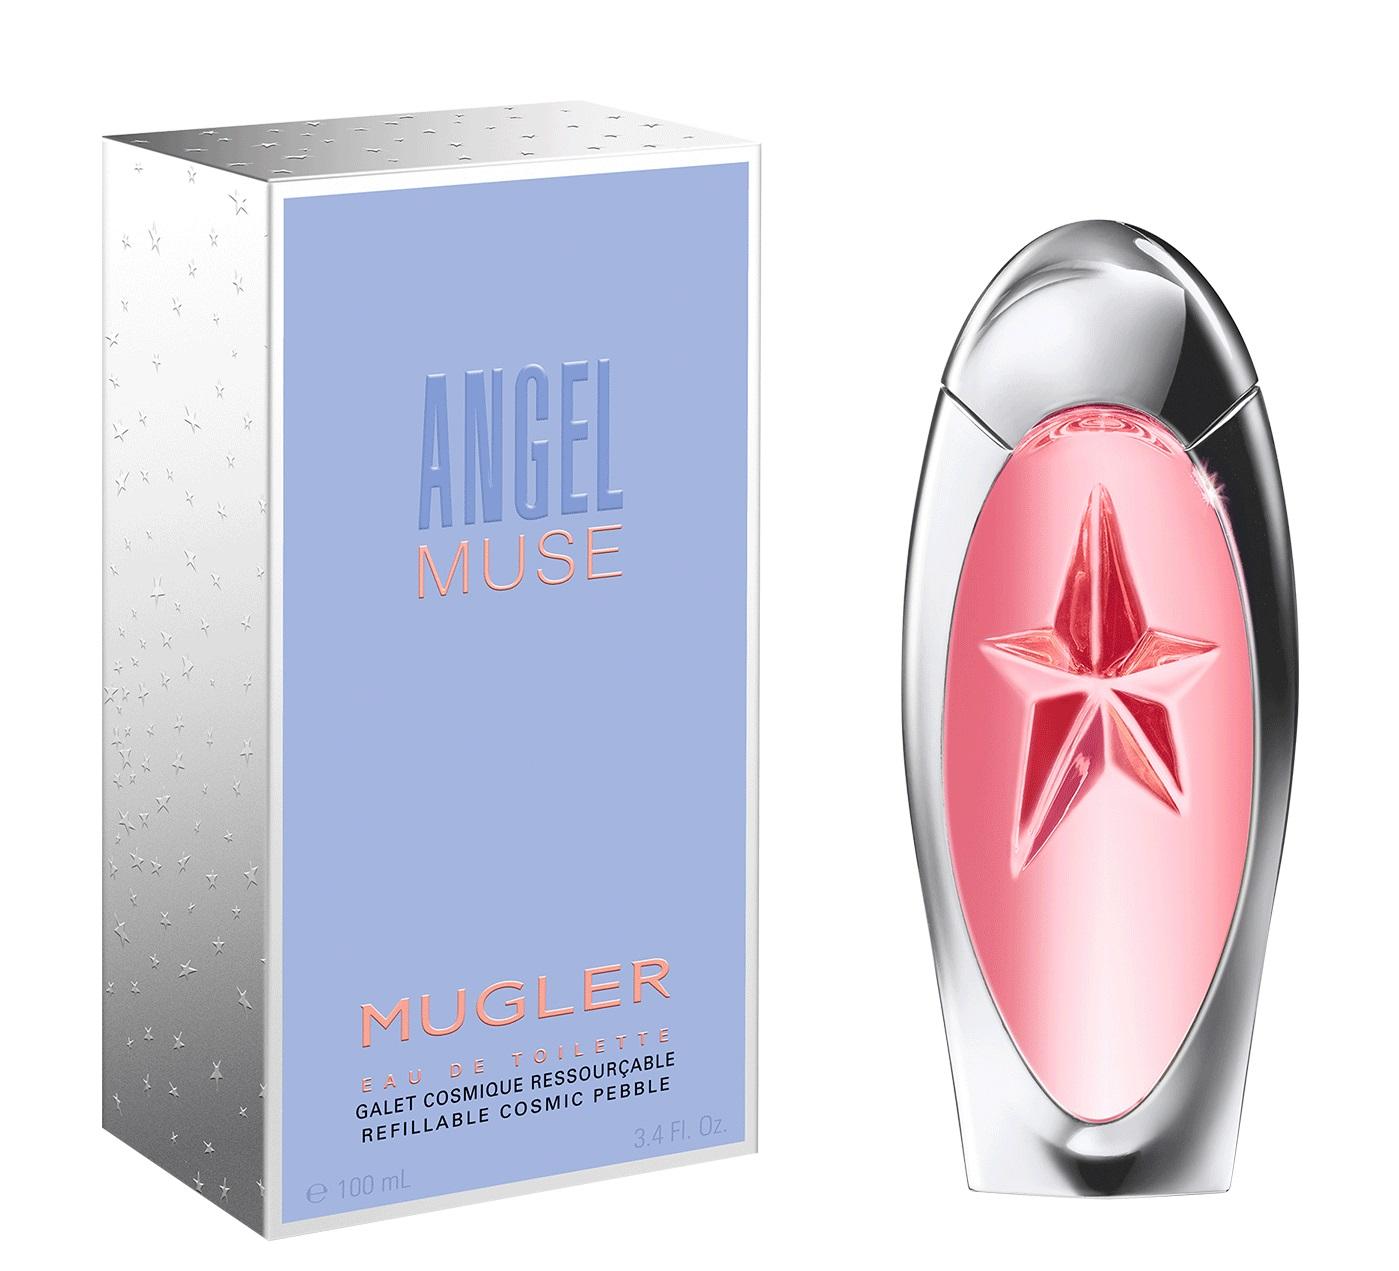 Angel Muse Eau De Toilette Mugler Parfum Un Nou Parfum De Dama 2017